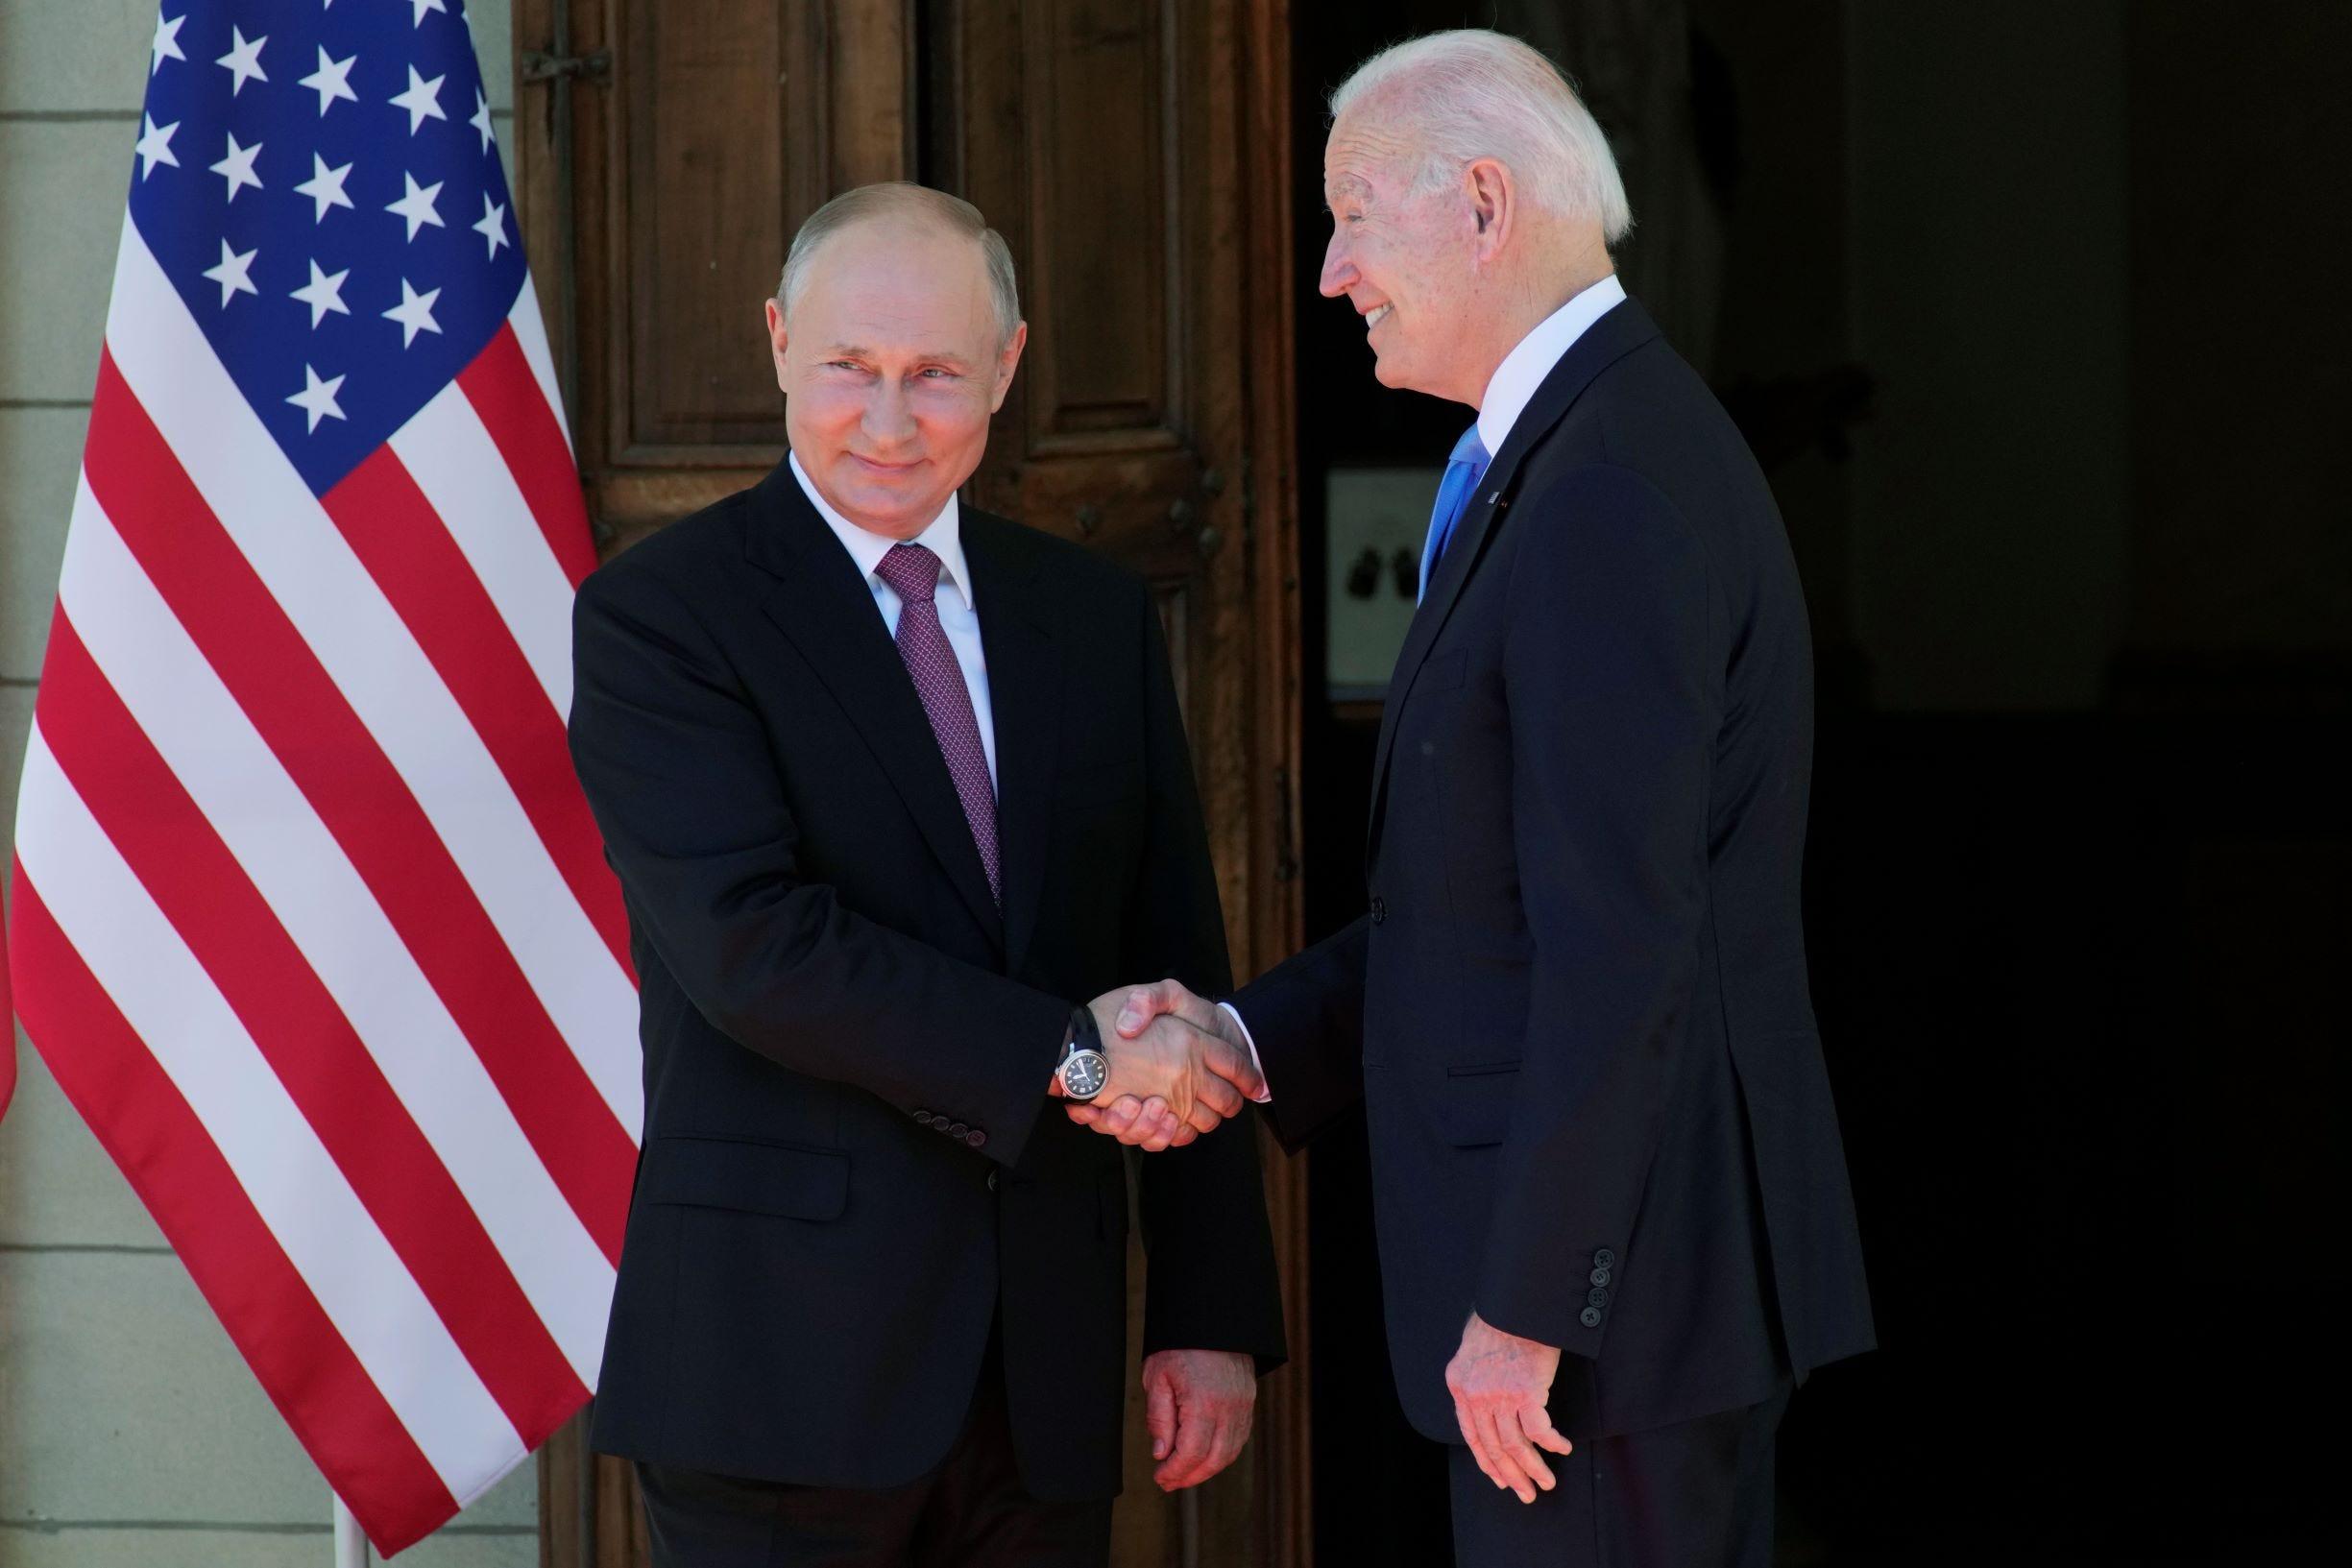 'Practical work' summit for Biden, Putin: No punches or hugs 2